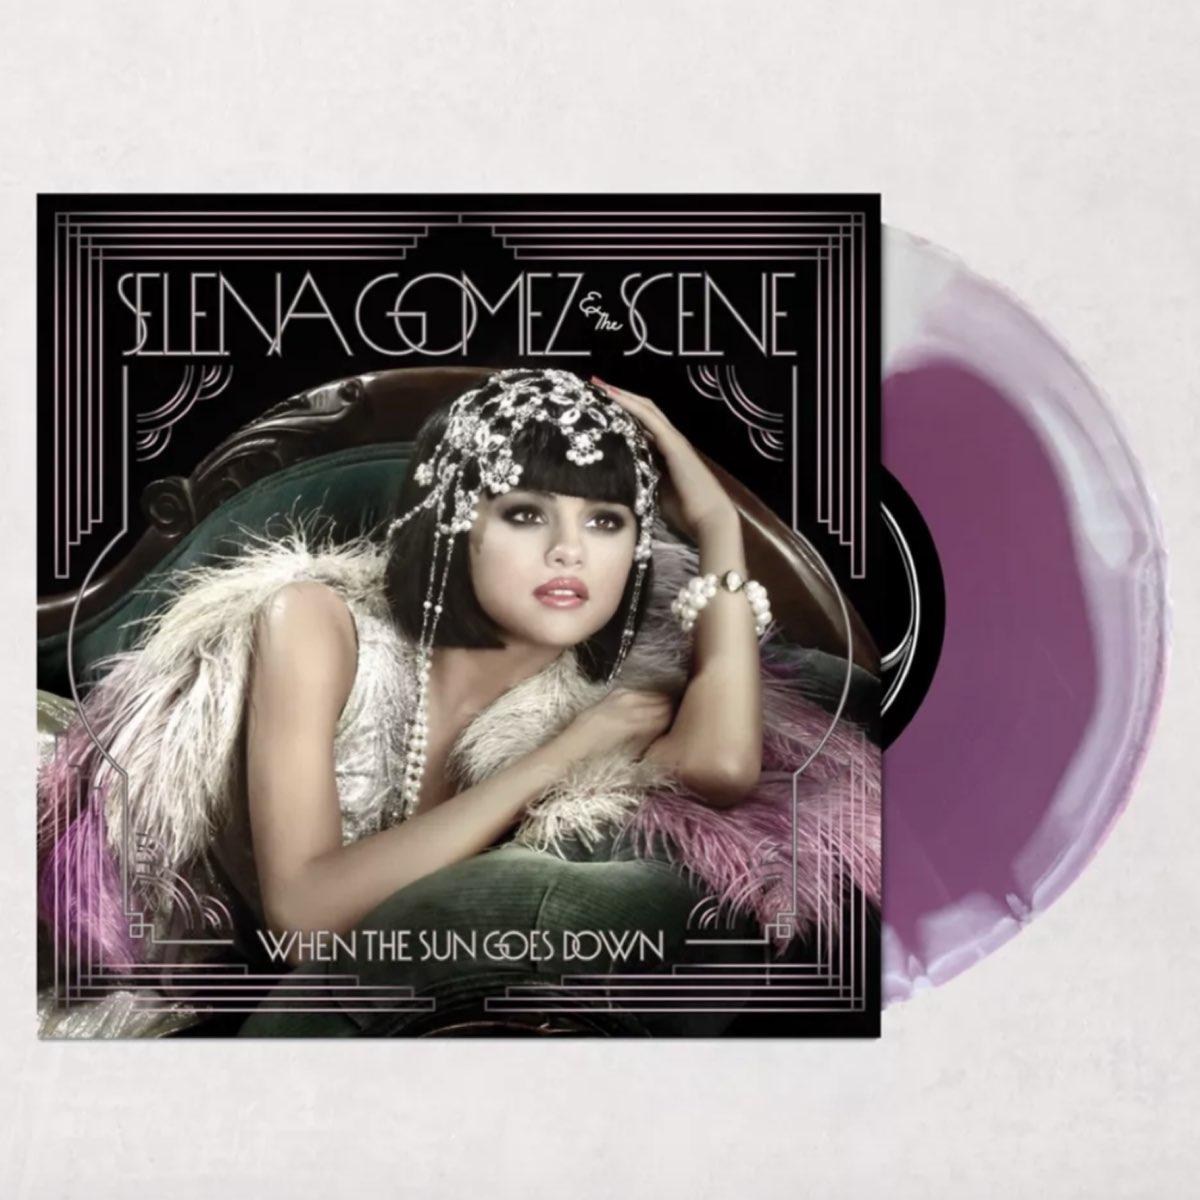 Selena Gomez & The Scene - When The Sun Goes Down [Edição Limitada - Urban Outfitters]